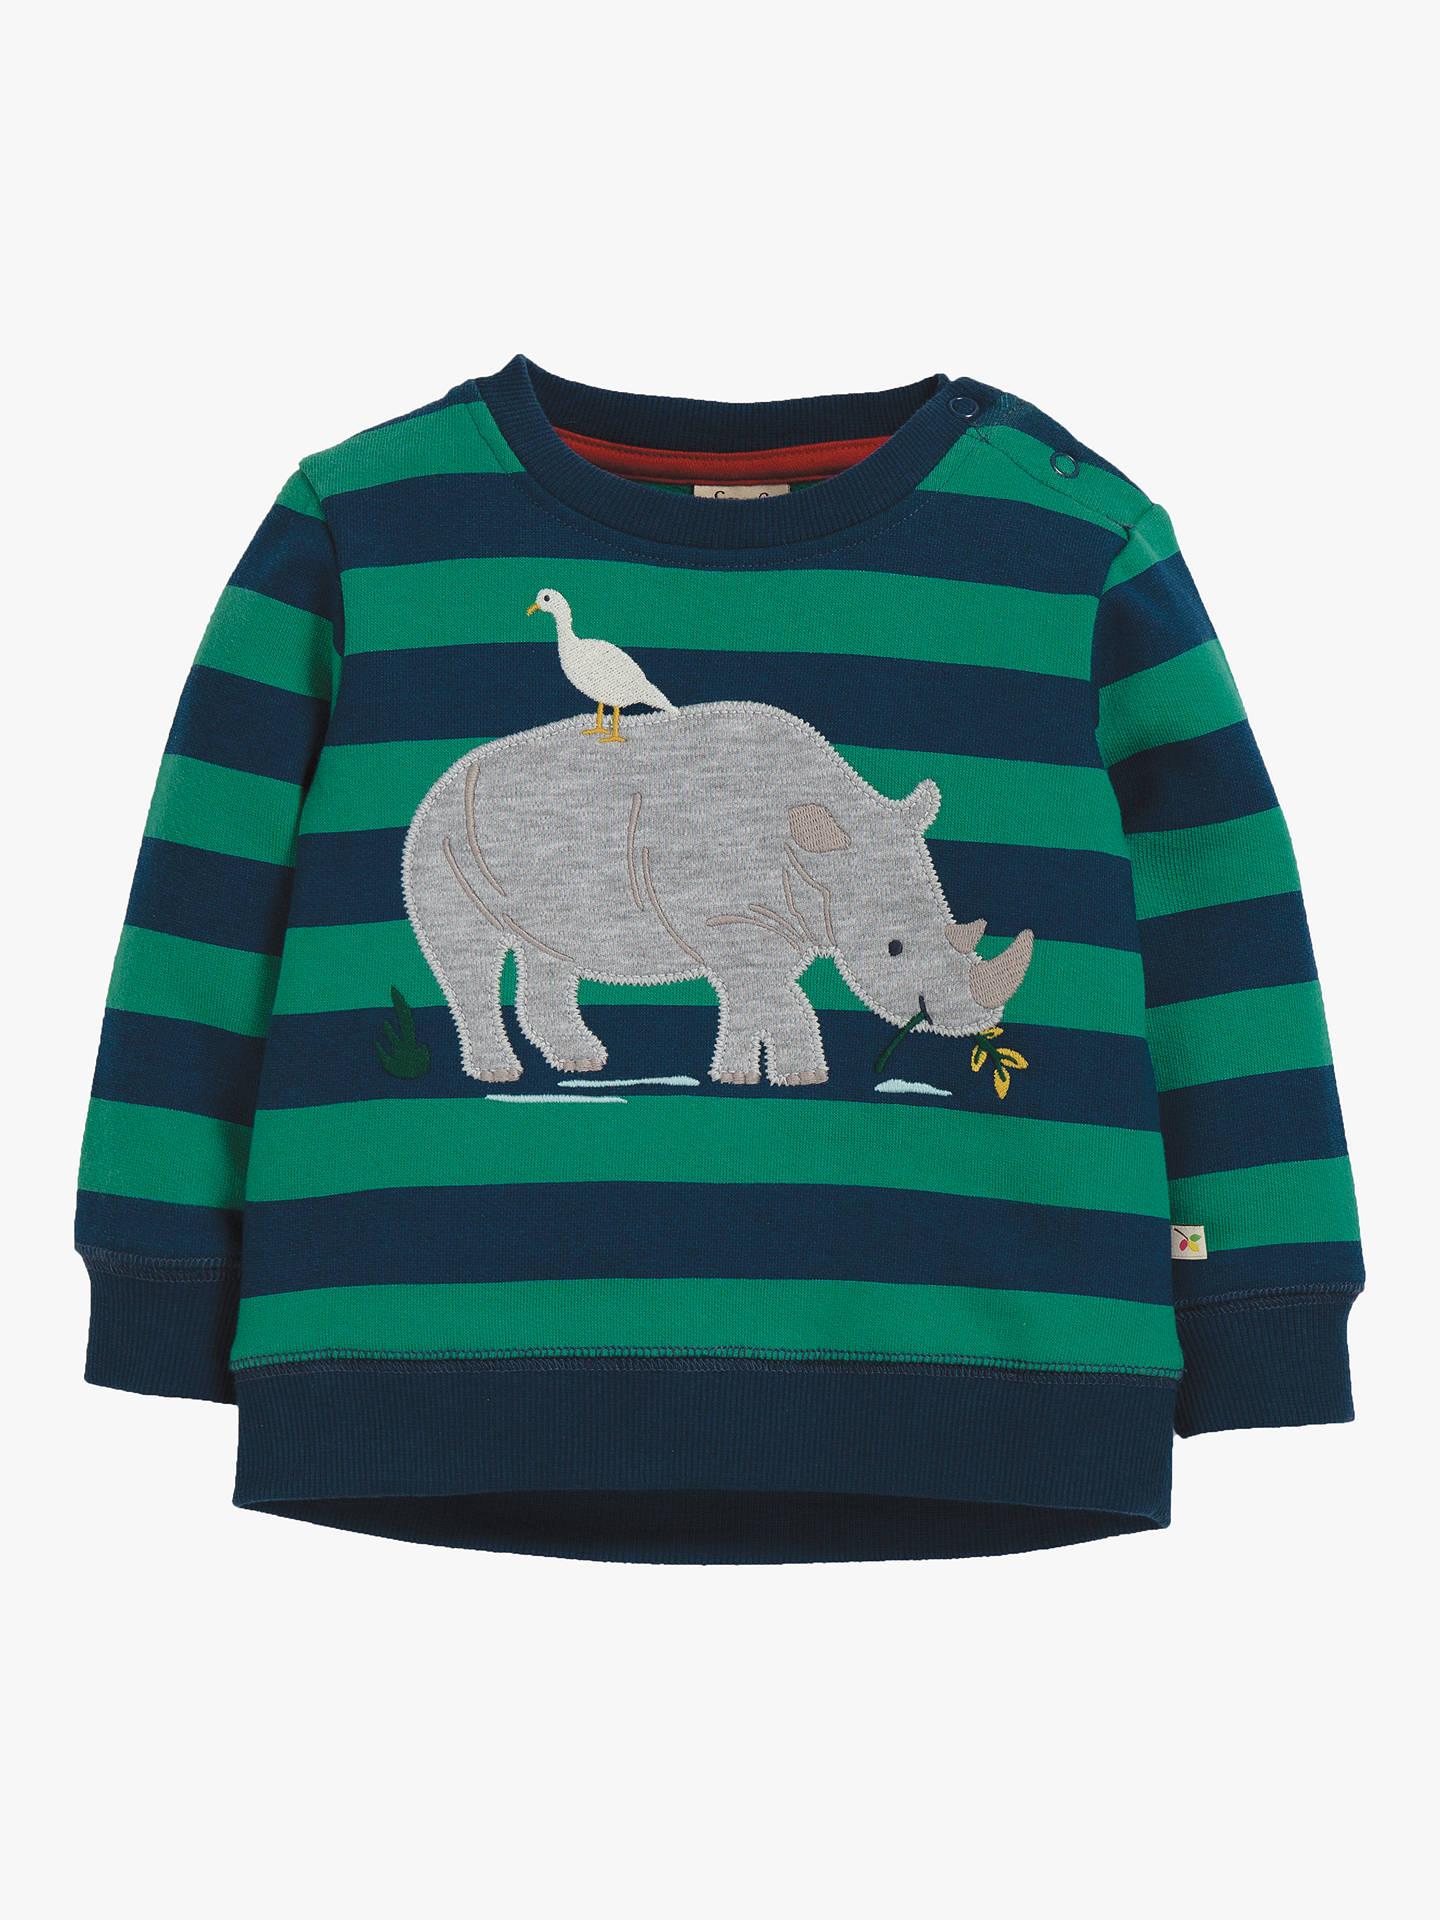 Joules orange and white rhino print t-shirt age 3-4